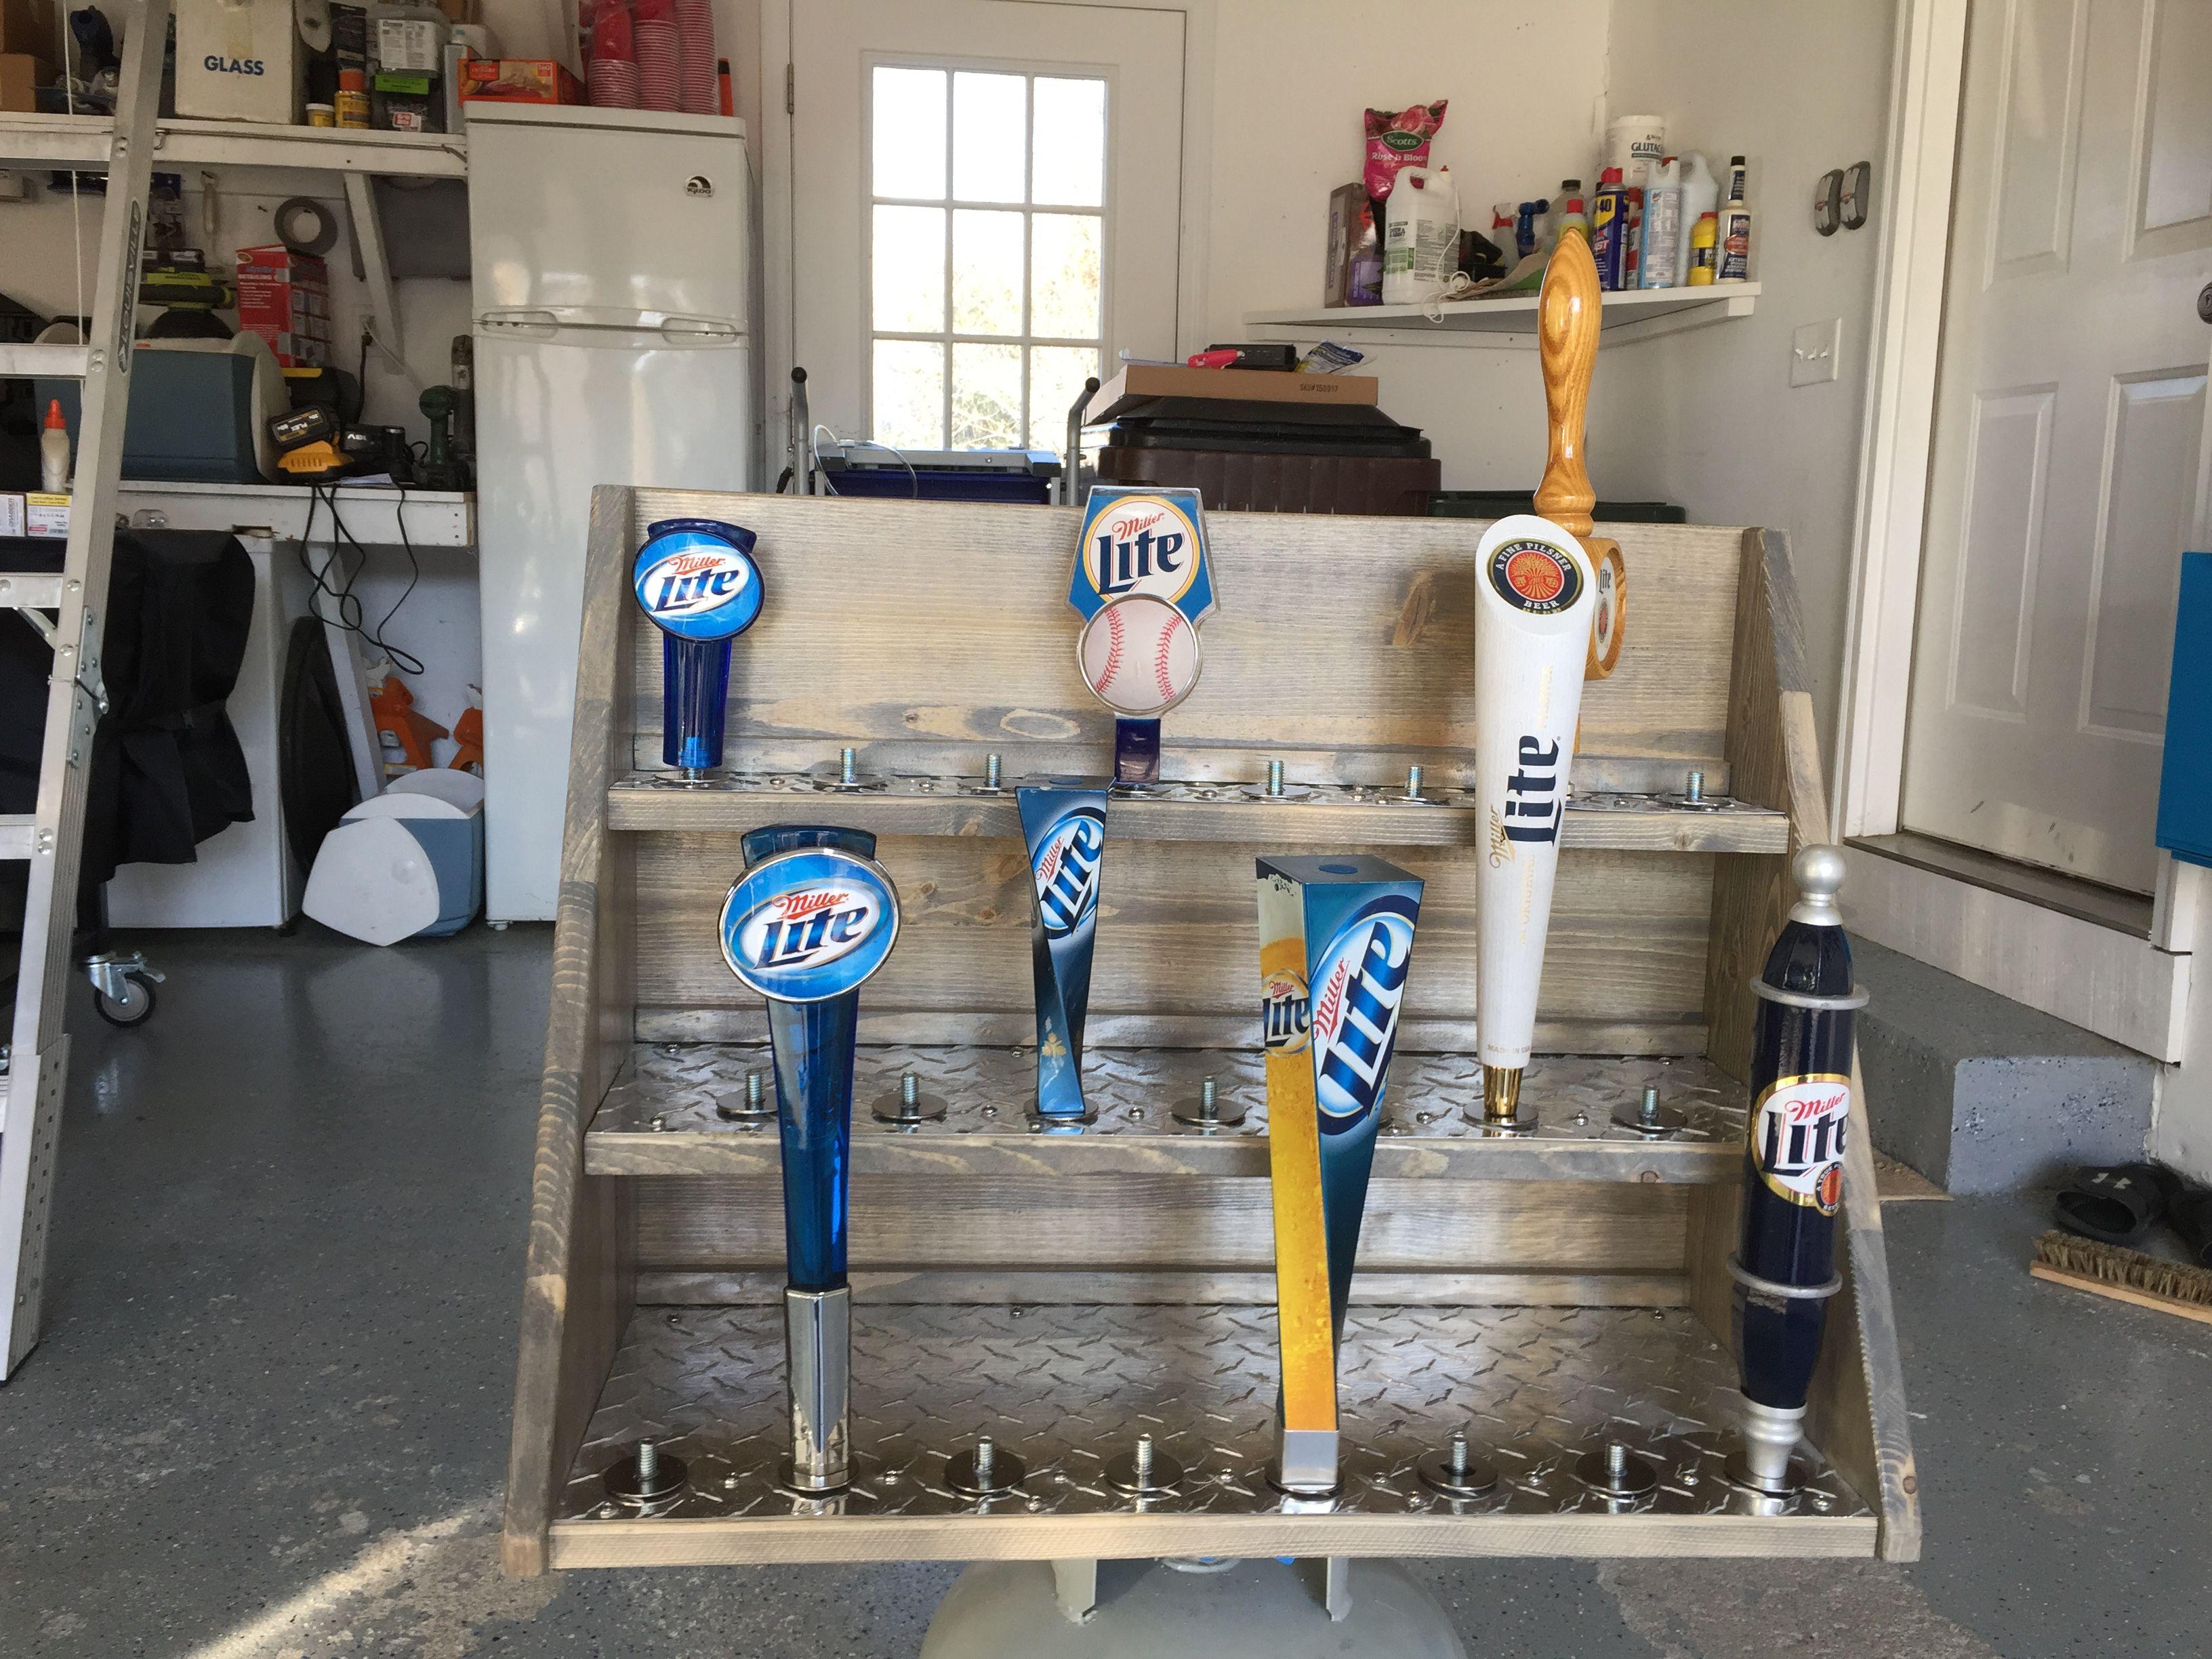 Diy Beer Tap Handle Display Diy Projects Pinterest